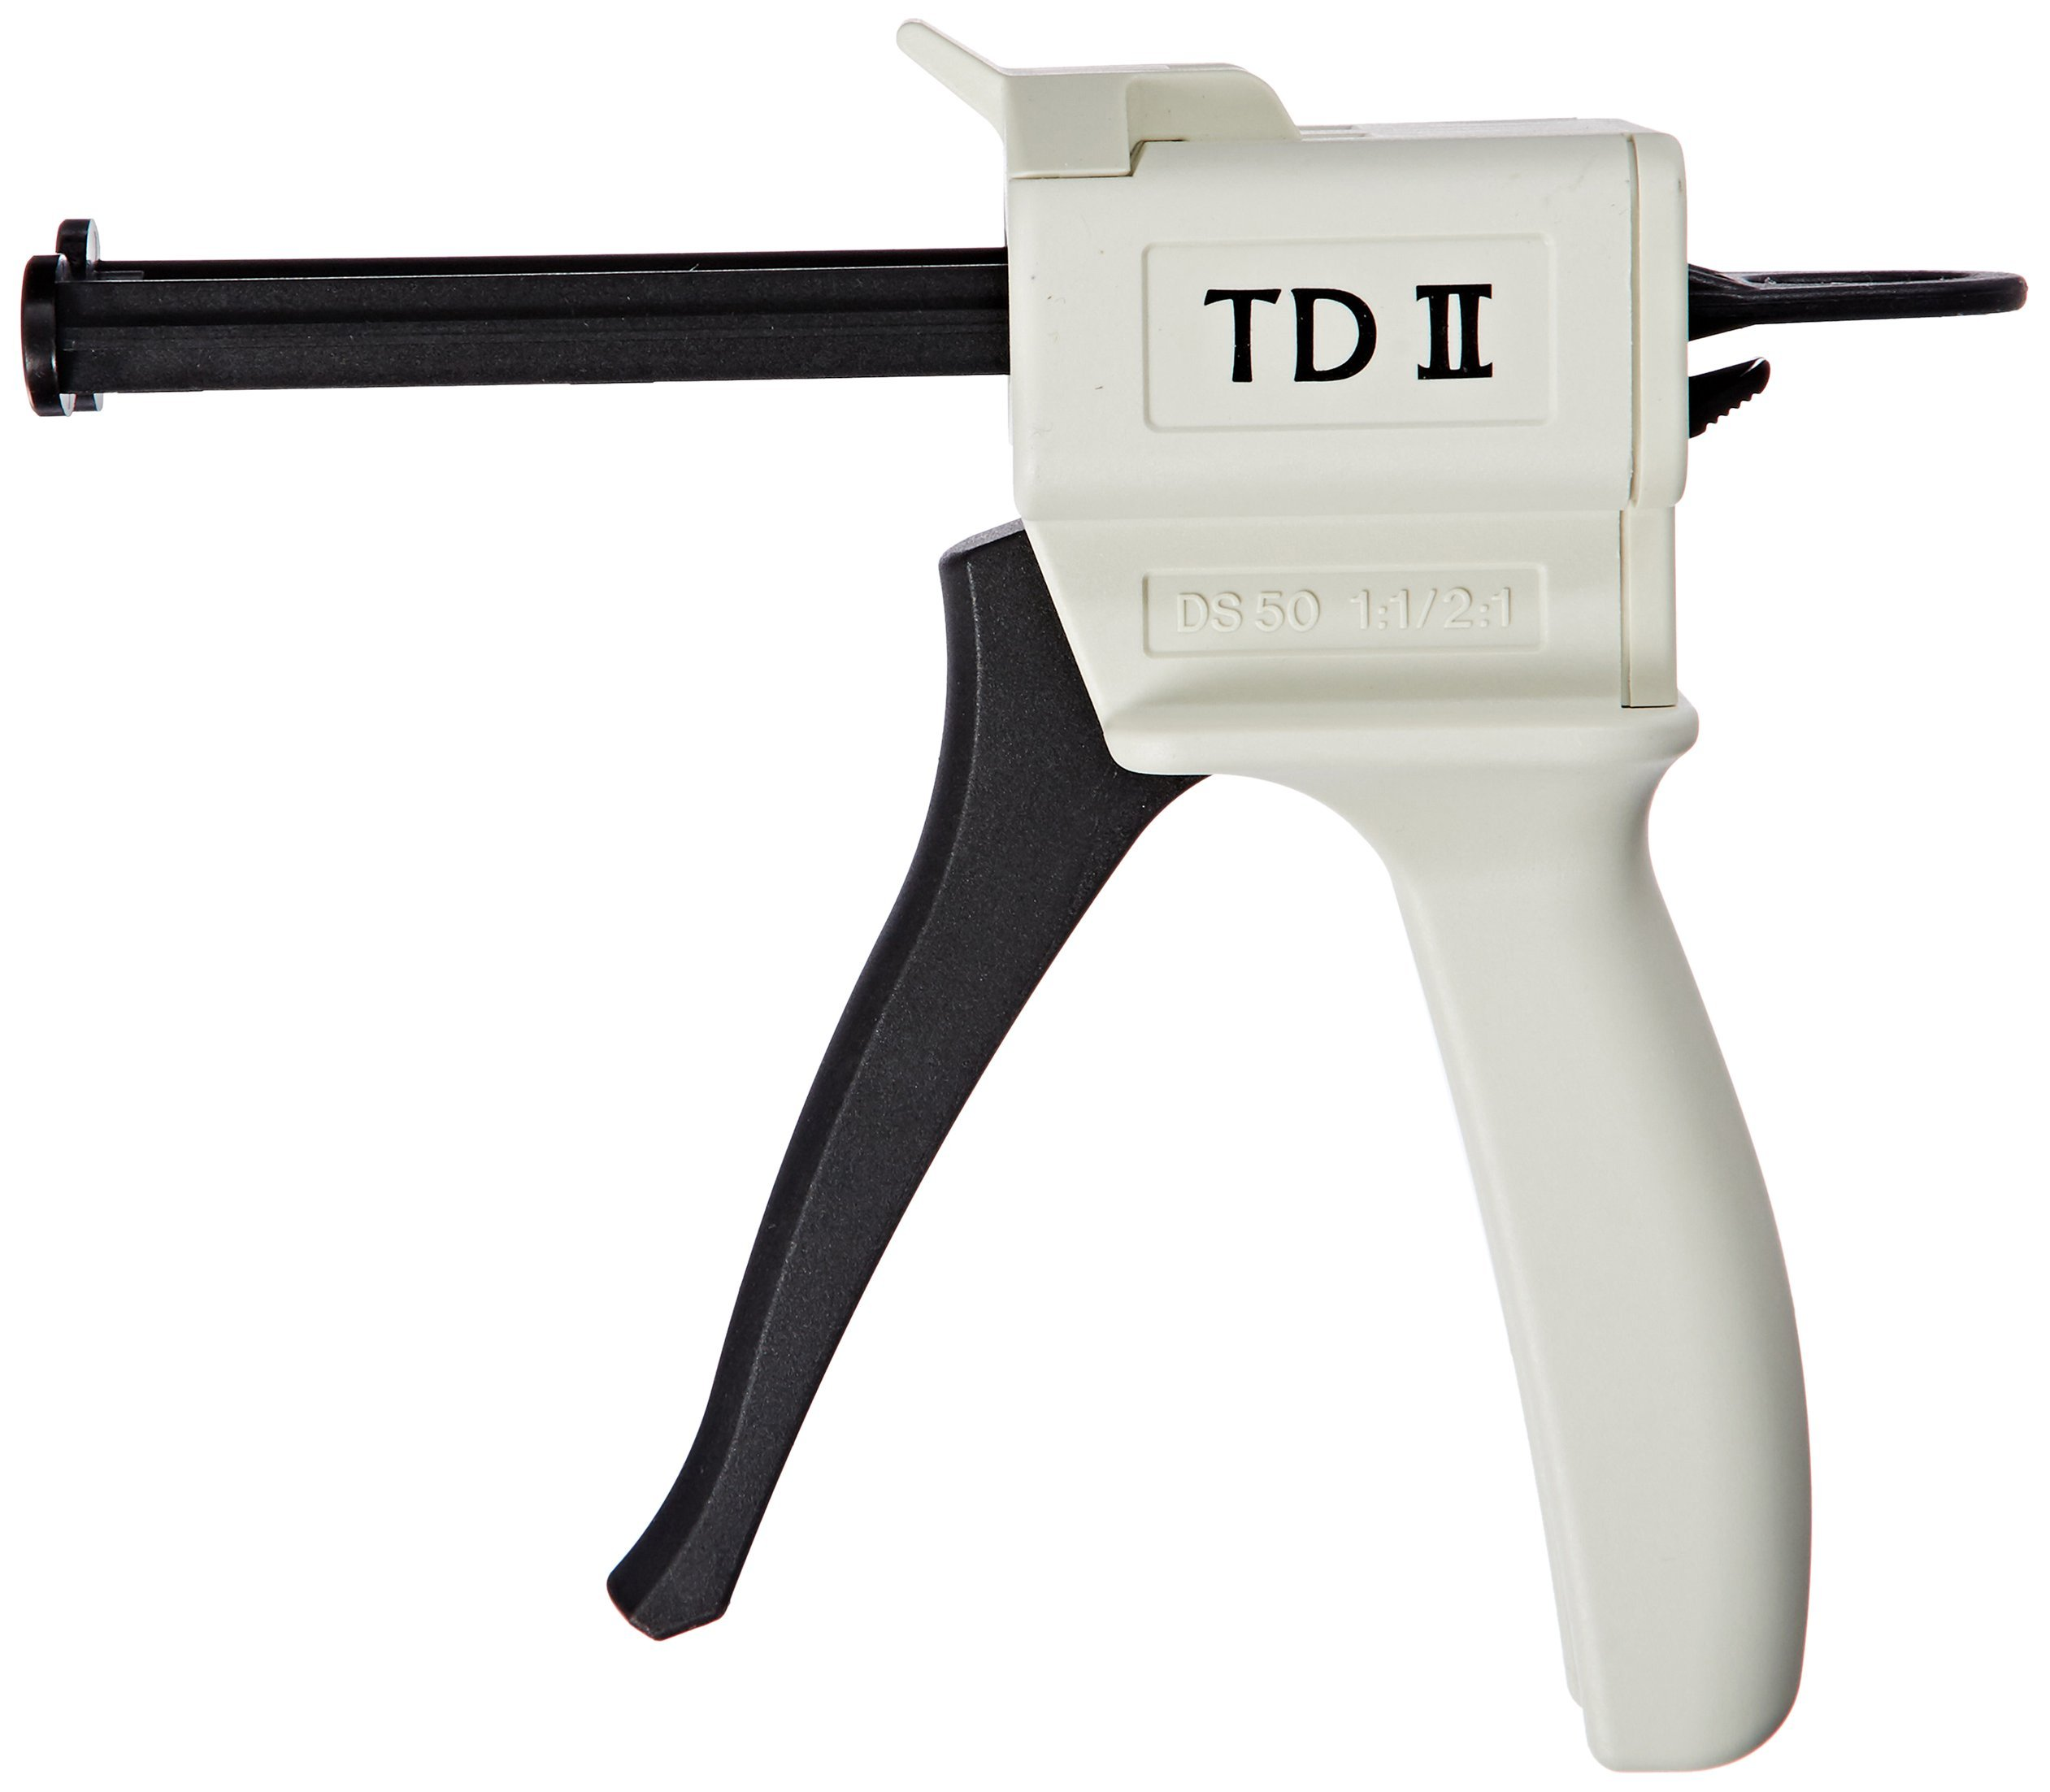 Tokuyama 23372 TD II Dispenser